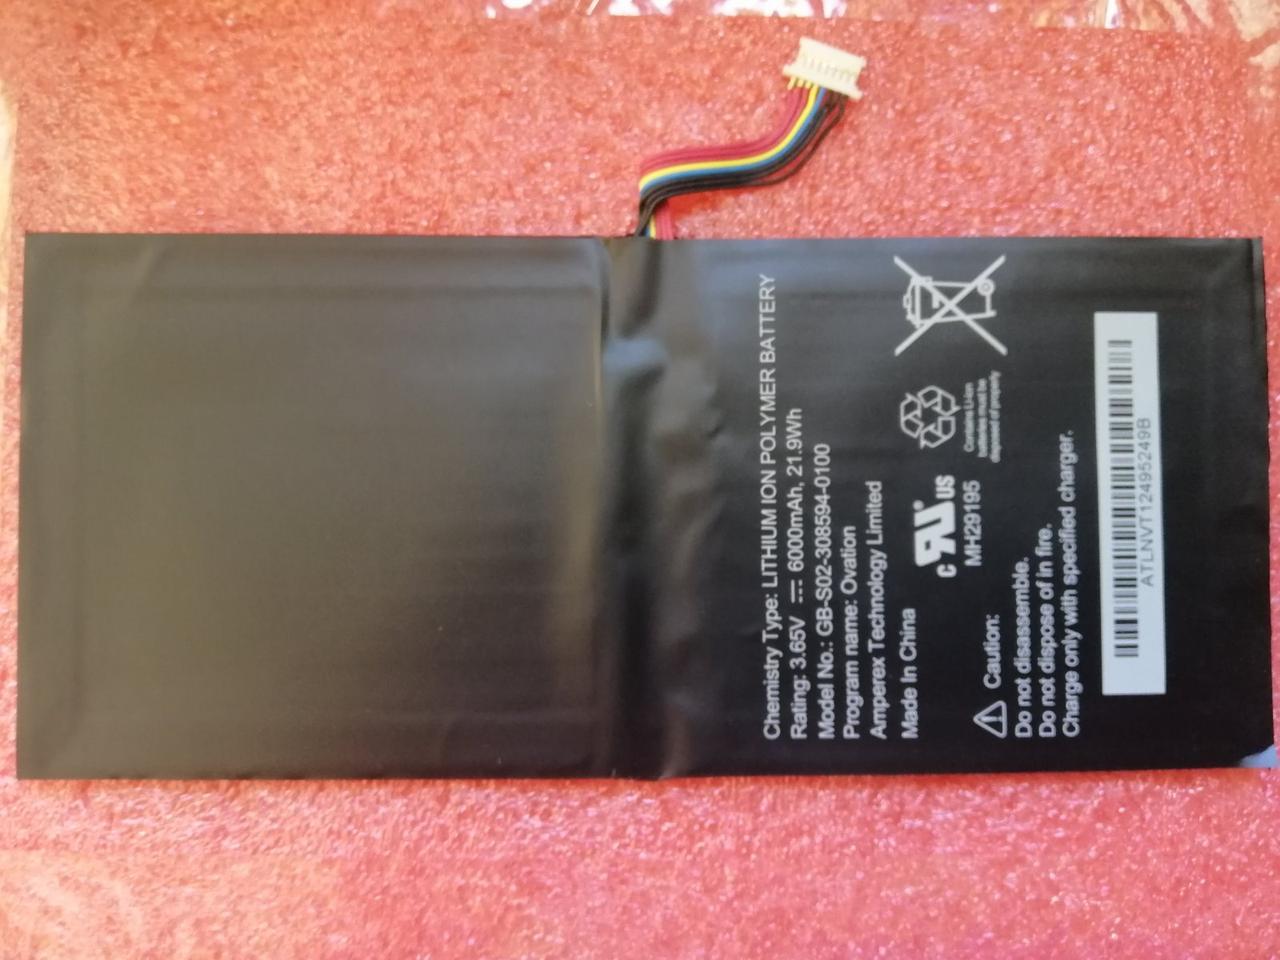 Аккумулятор Barnes & Noble AVPB00, AVPB002-A110-01, BNTV600, GB-S02-308594-0100, BNTV600, Nook HD+ Plus, NOOK